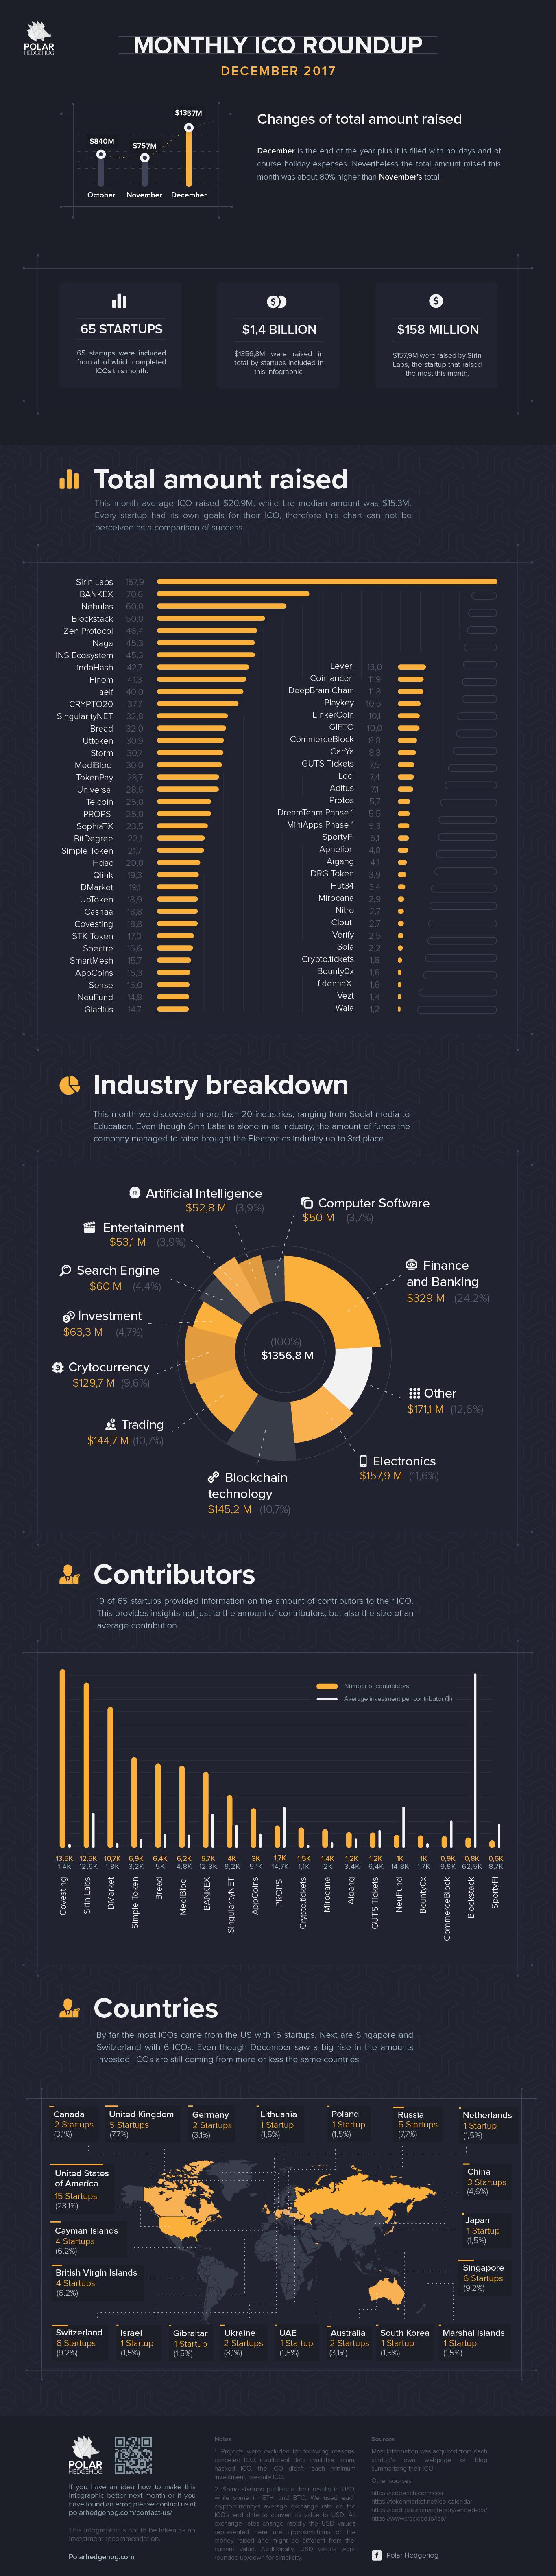 Polar Hedgehog - ICO Roundup Infographic - December 2017.png